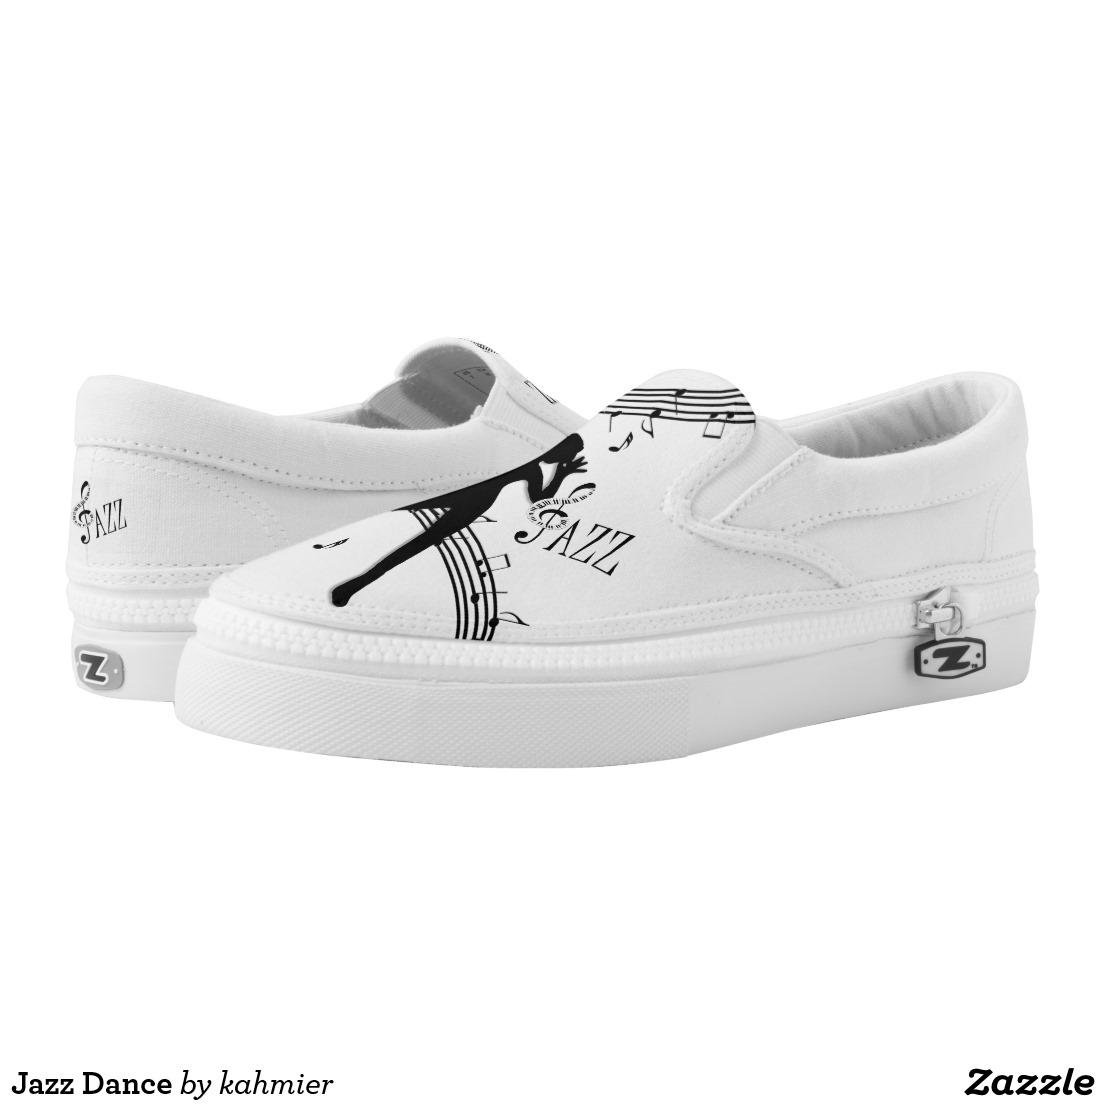 Jazz Dance Slip-On Sneakers